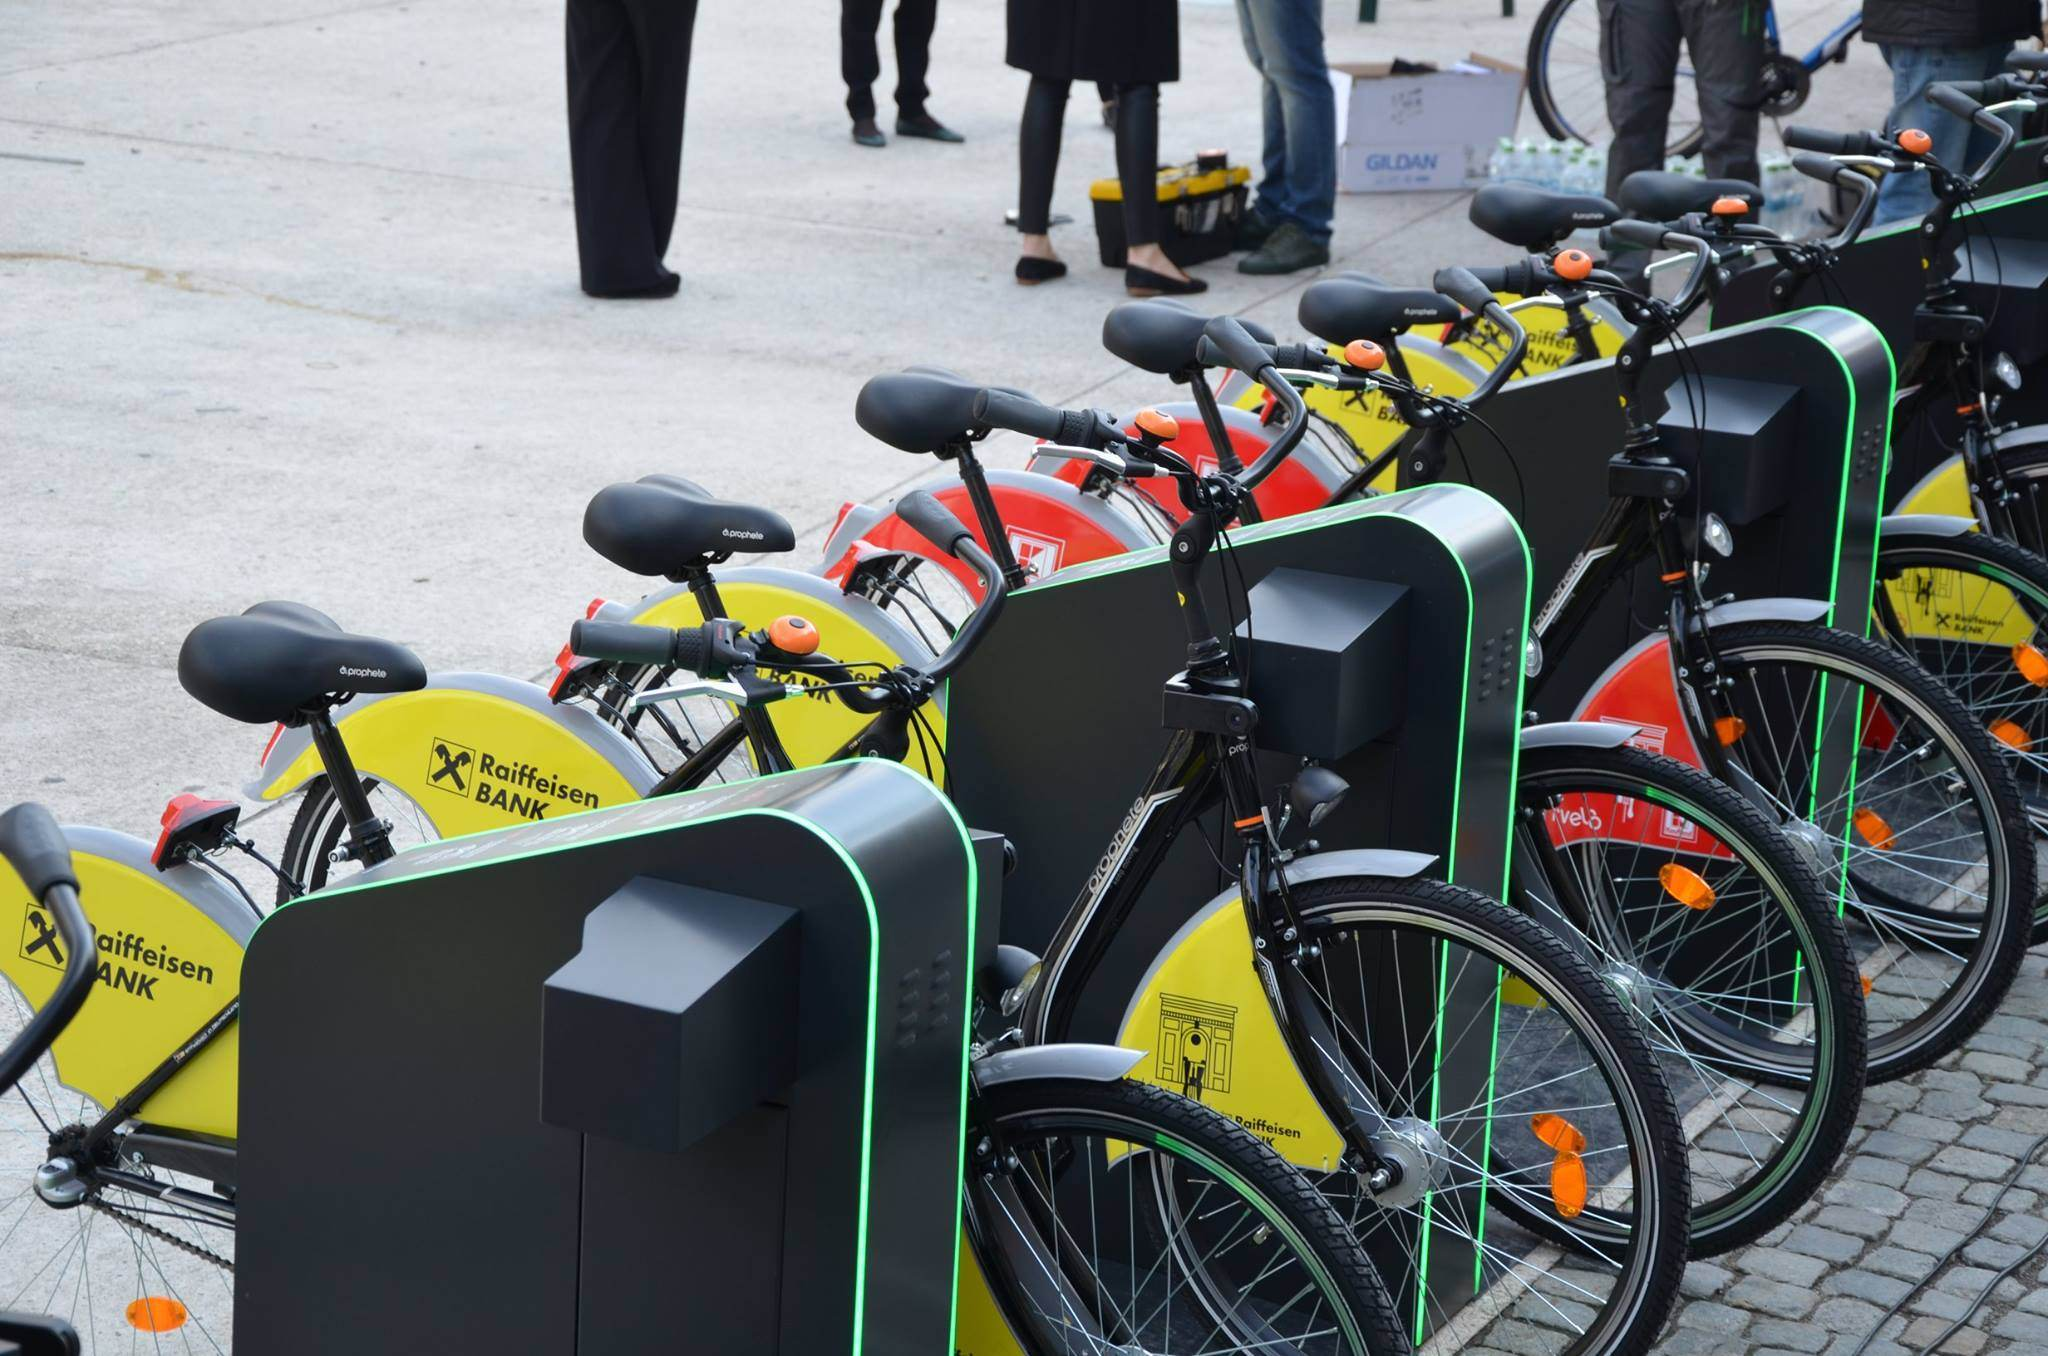 In sfarsit, bike-sharing automatizat in Bucuresti. S-a lansat I'Velo Urban.